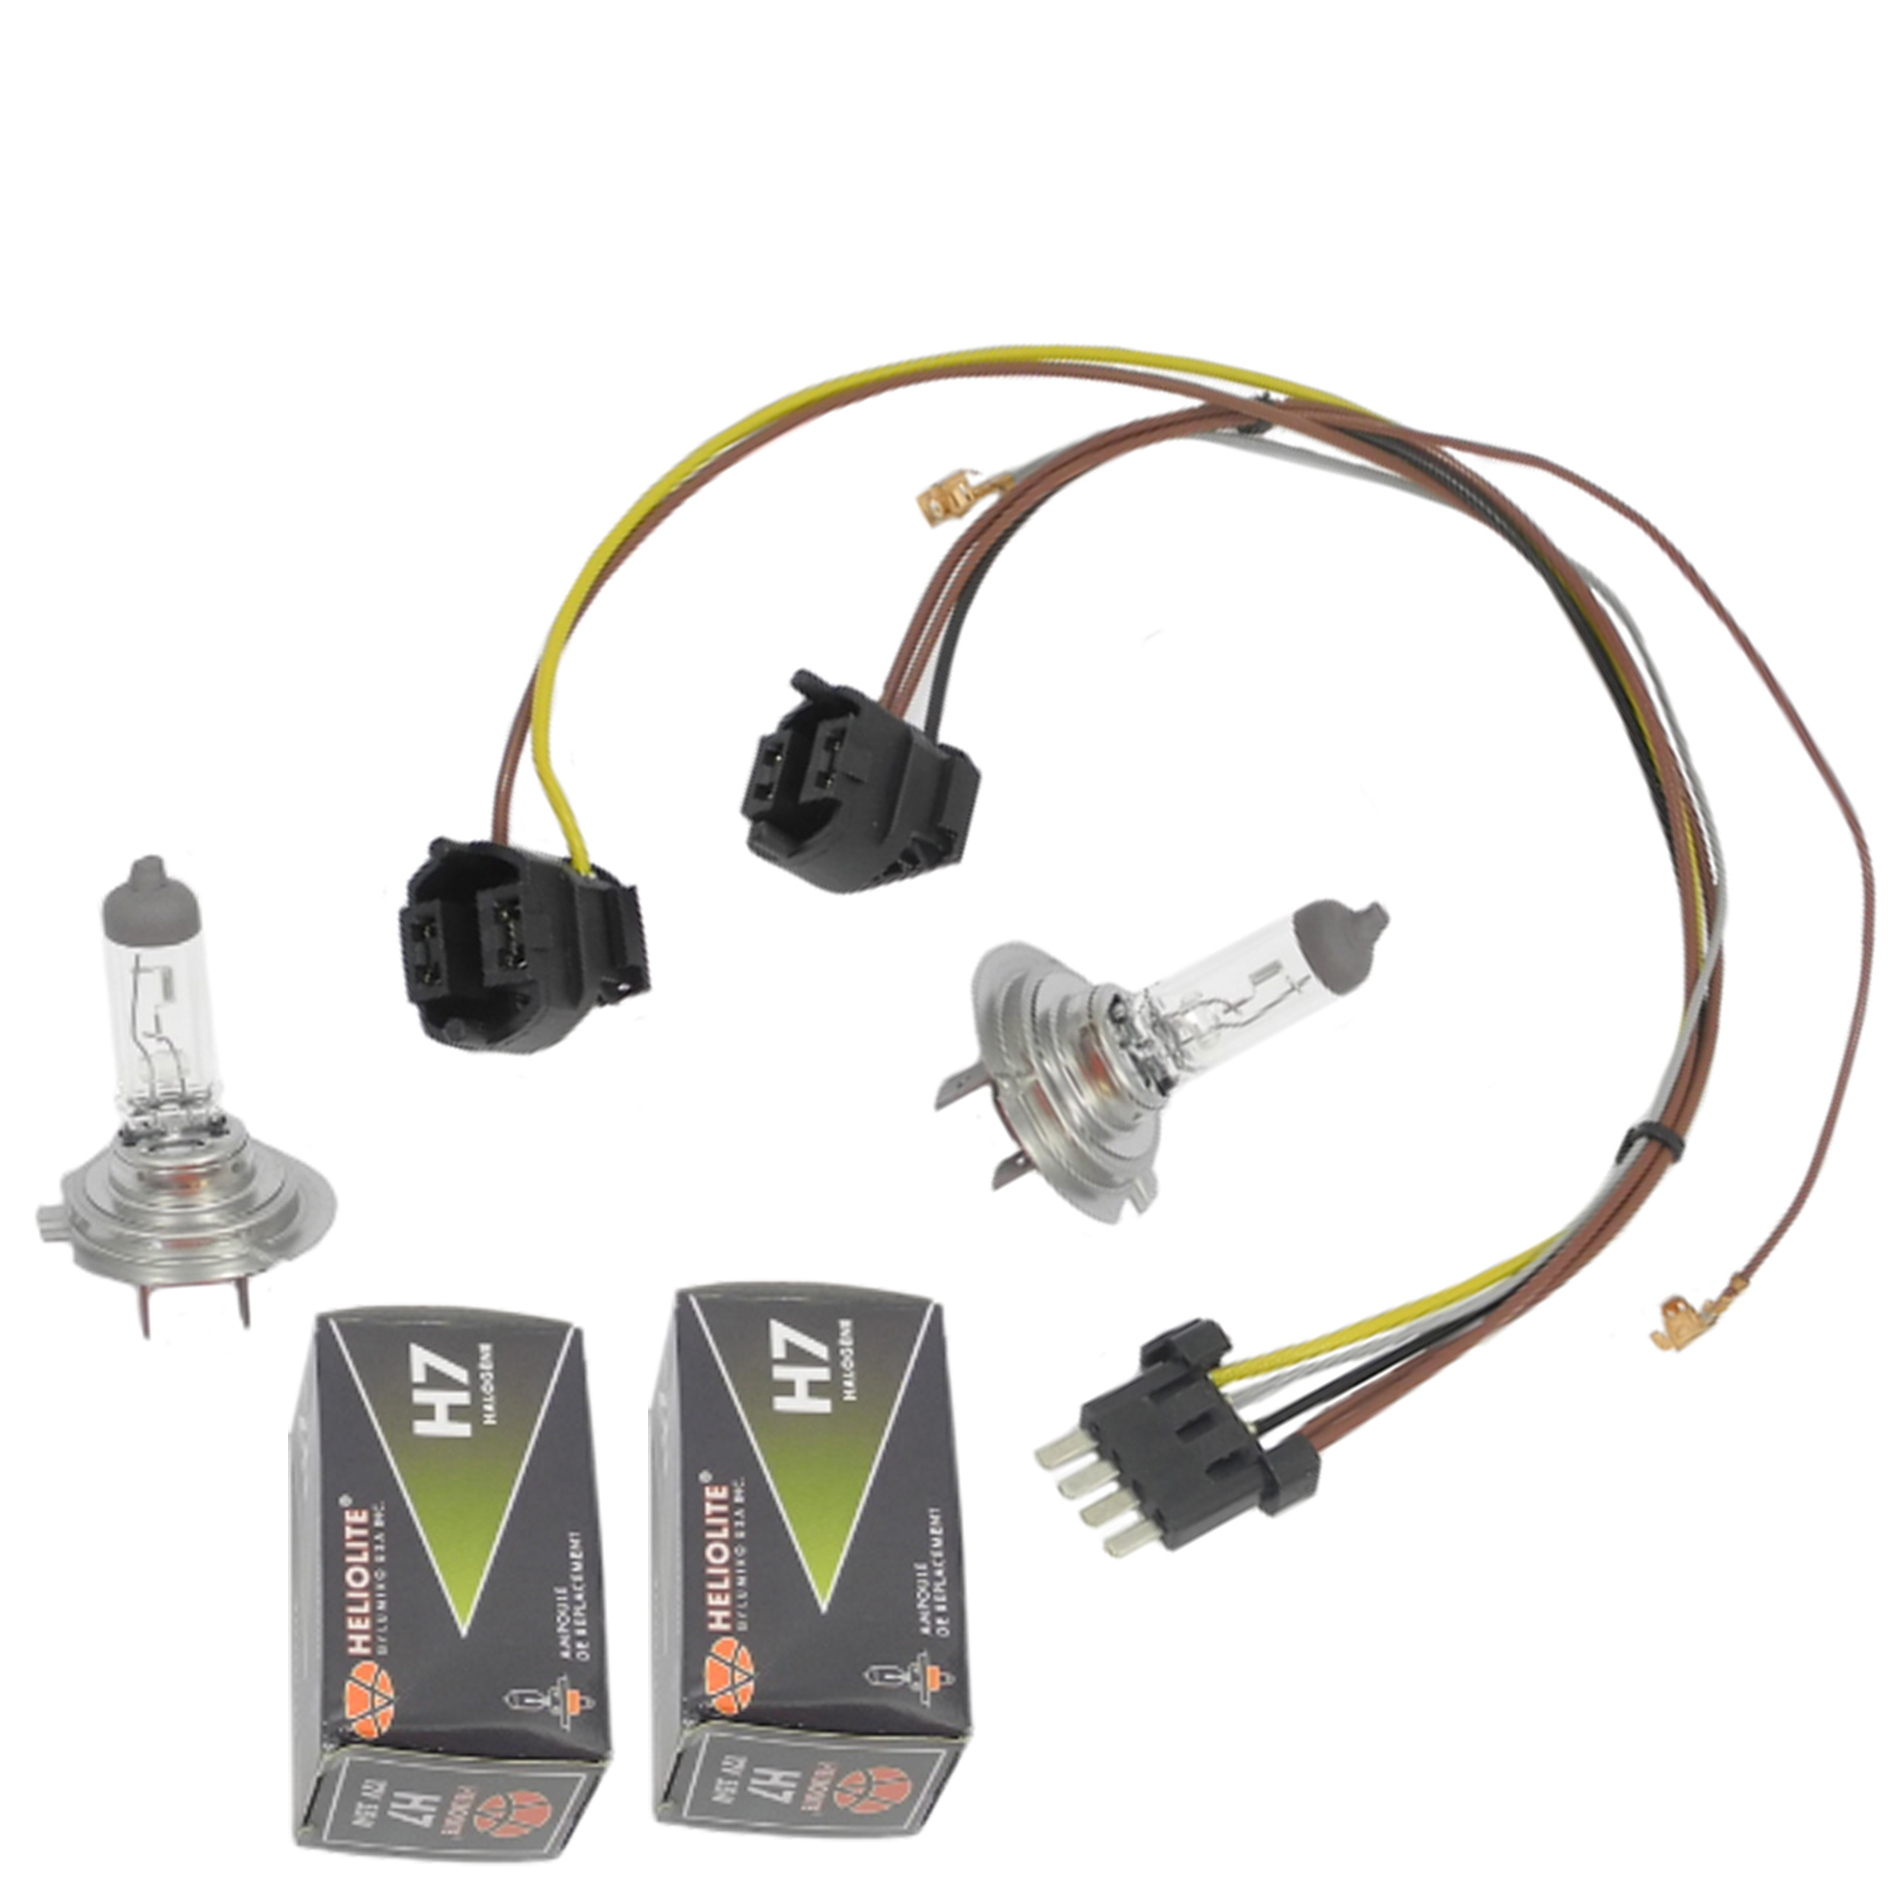 hight resolution of for benz ml320 ml350 left right headlight wiring harness headlight bulb h7 55w